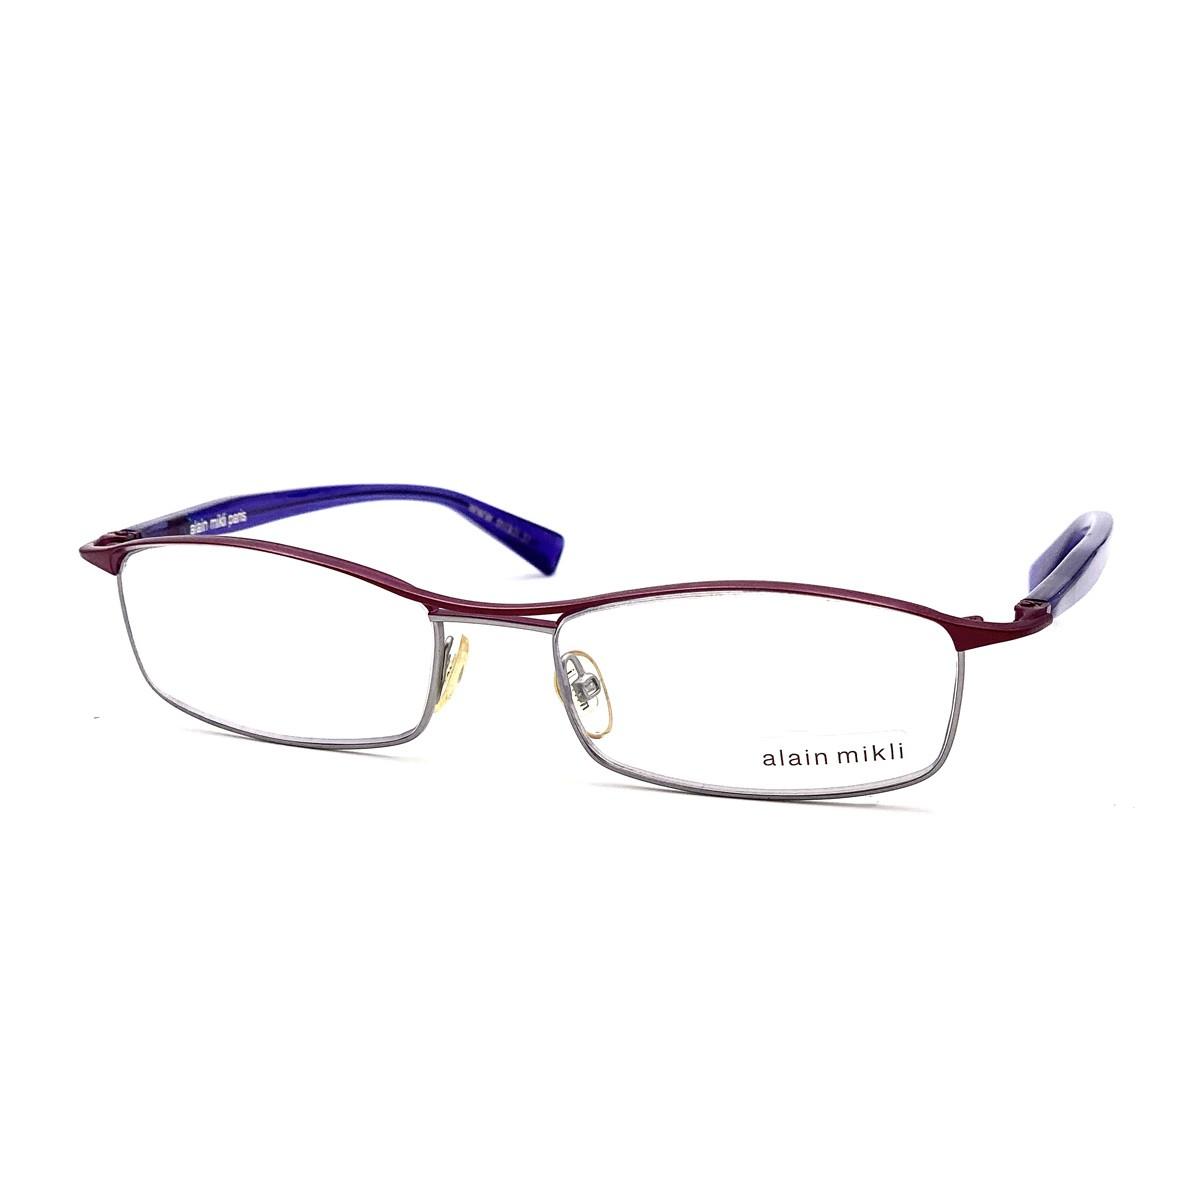 Alain Mikli A0364   Women's eyeglasses